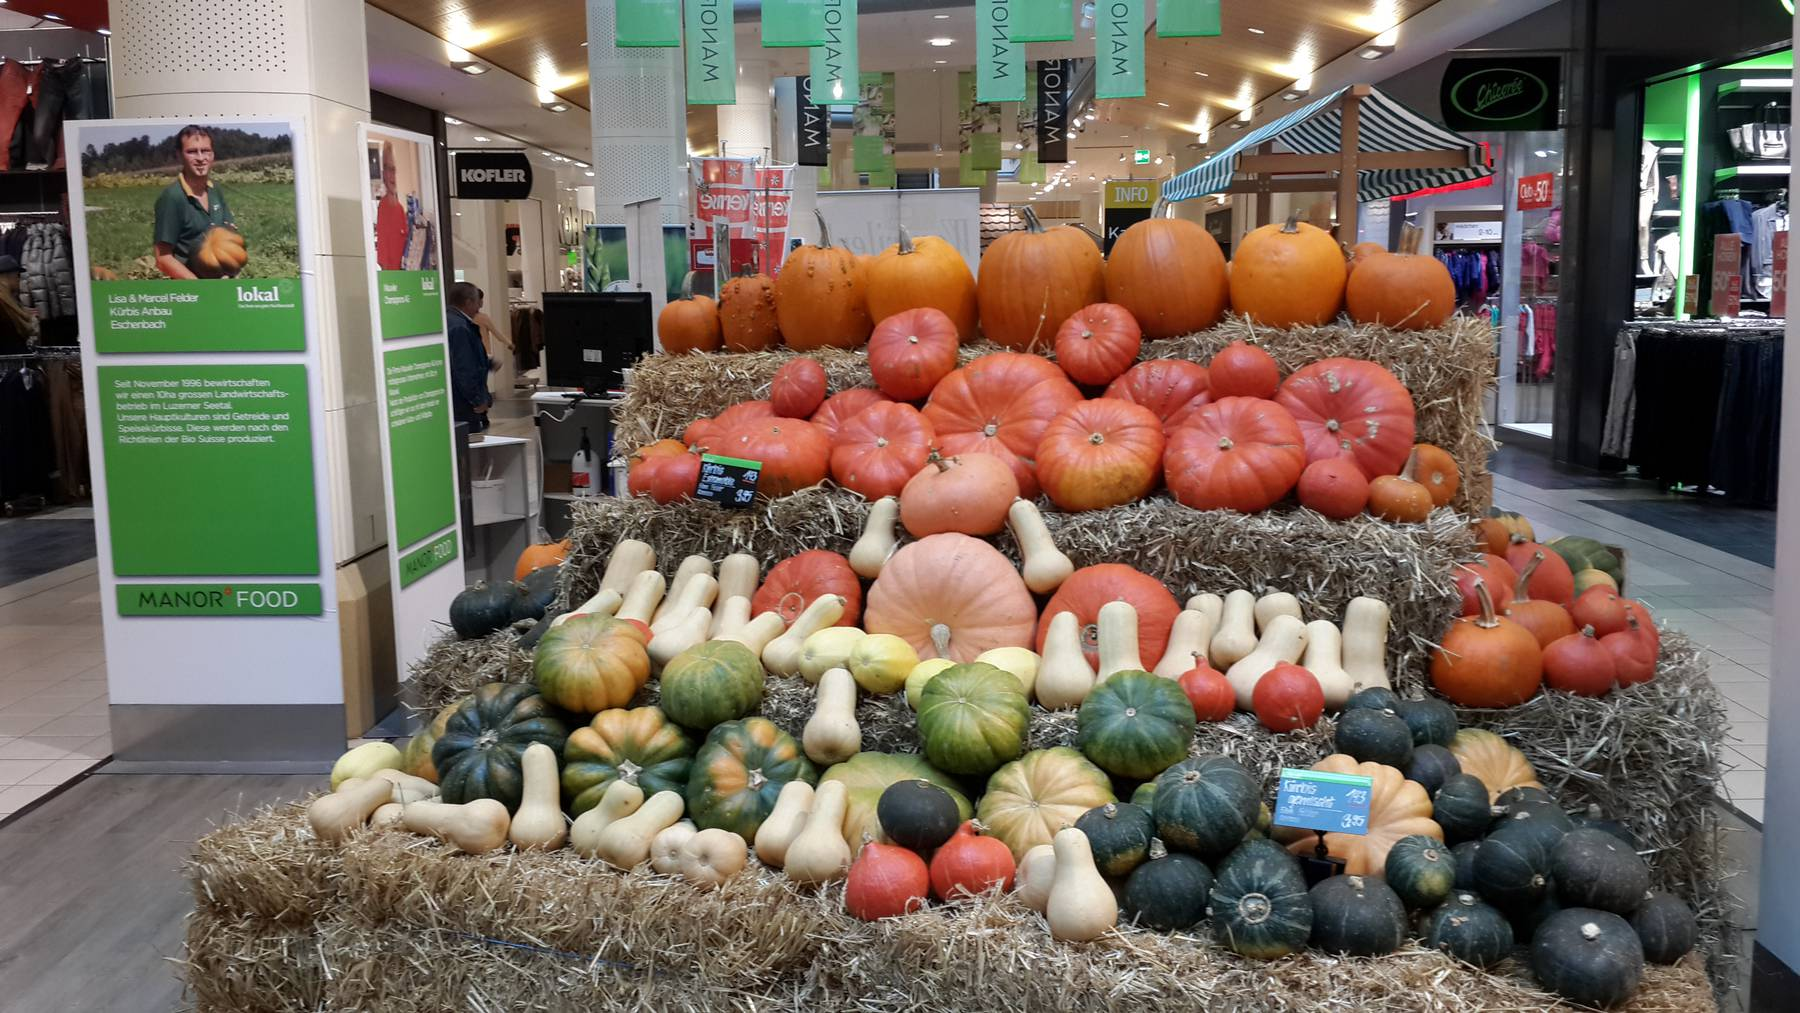 Lebensmittel-Kühltransporte sind mangelhaft